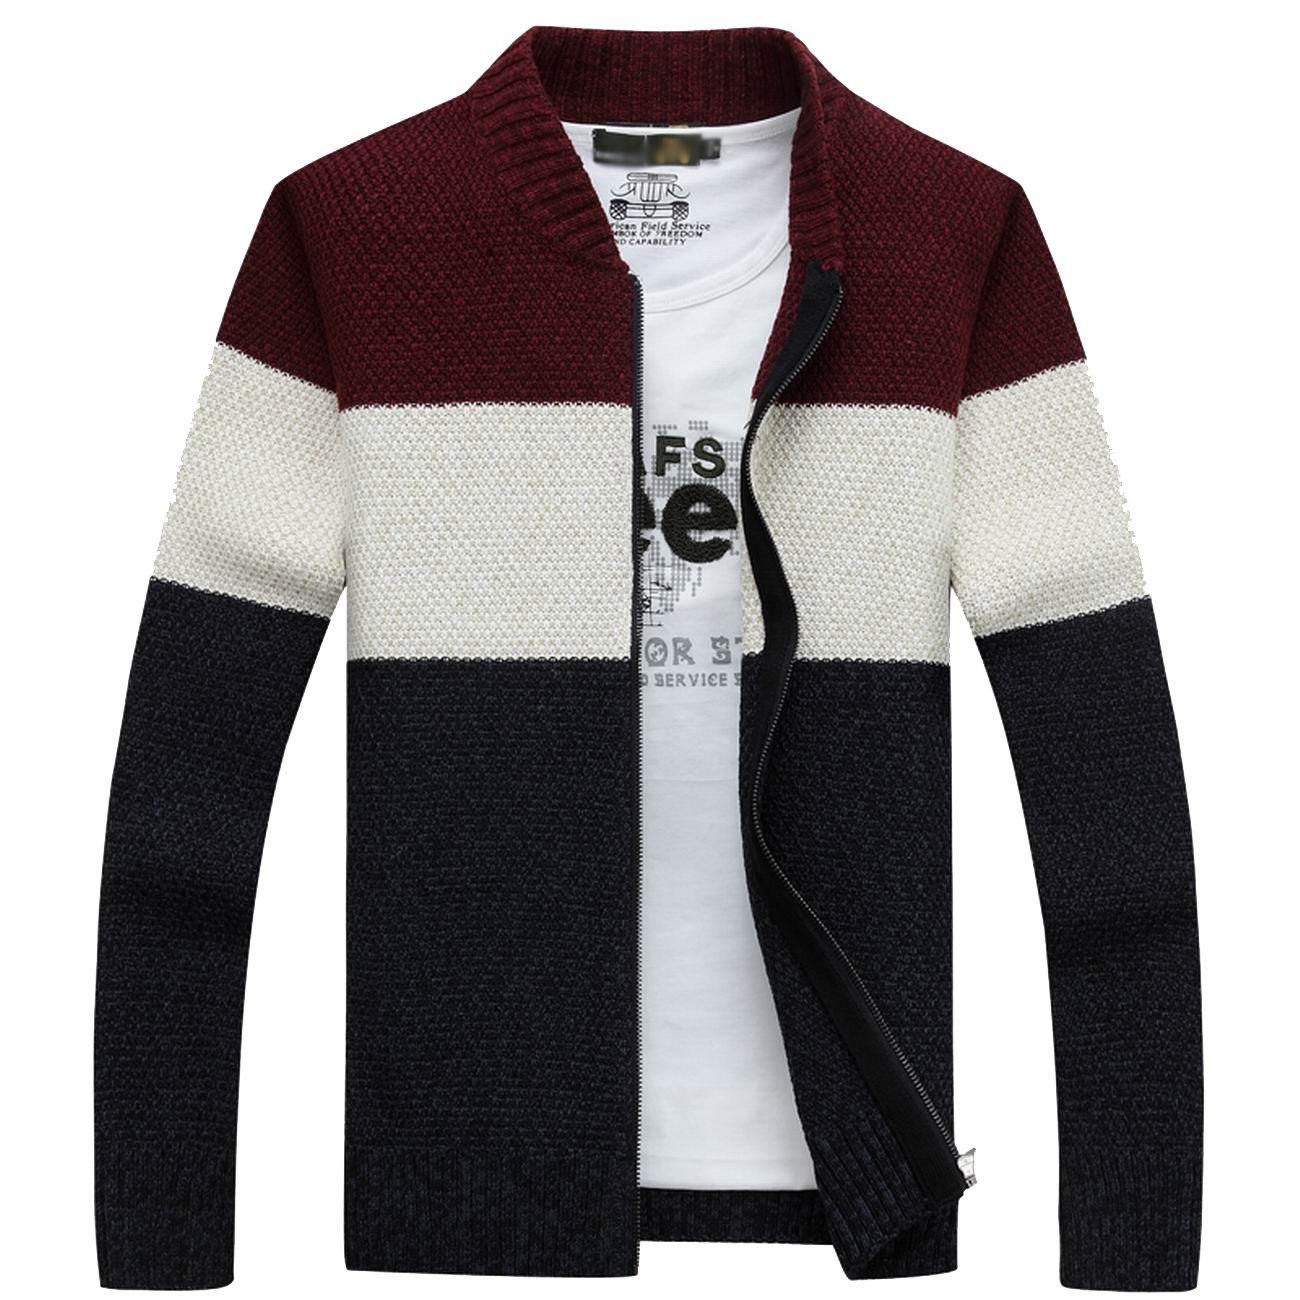 Fanhang Men's Knitted Zip Down Cardigan Sweater With Stripe (XXXL, BURGUNDY)